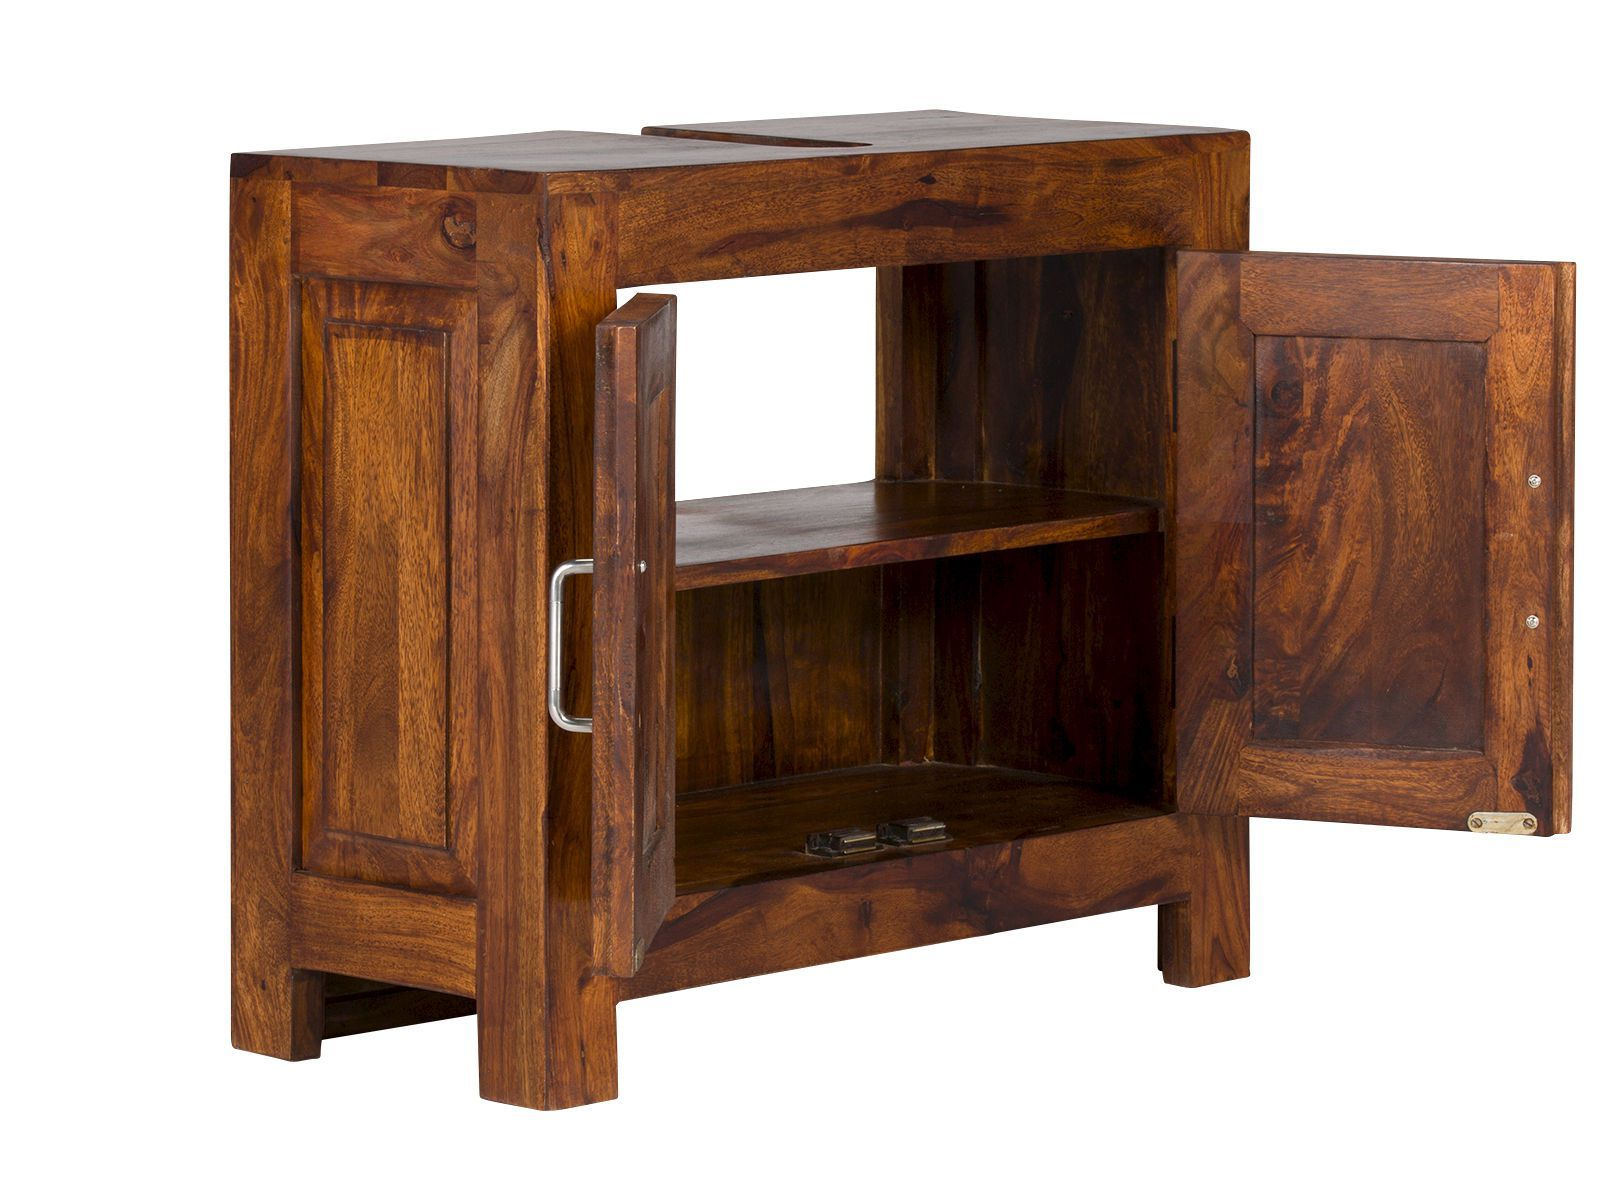 Waschbeckenunterschrank-Cubus-aus-massivem-Palisanderholz-braun ...